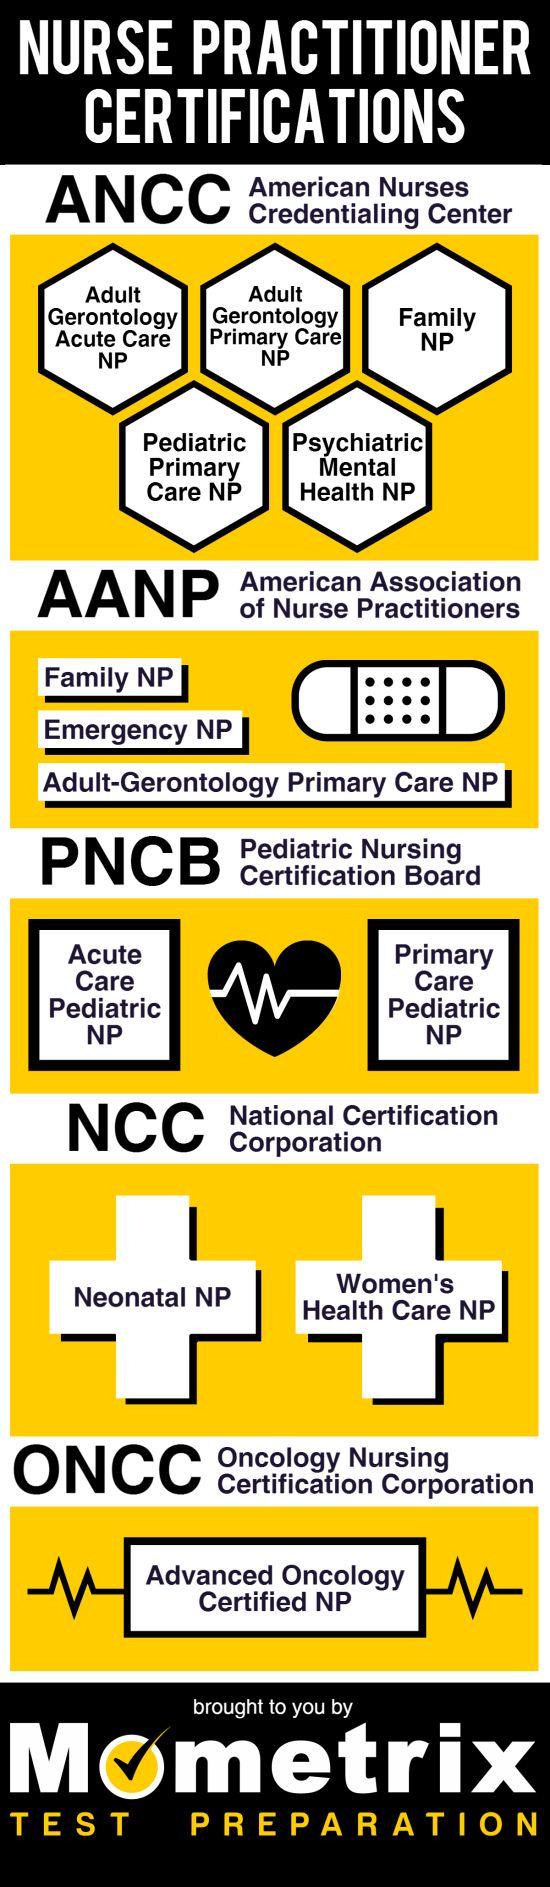 Nurse Practitioner Certification Review